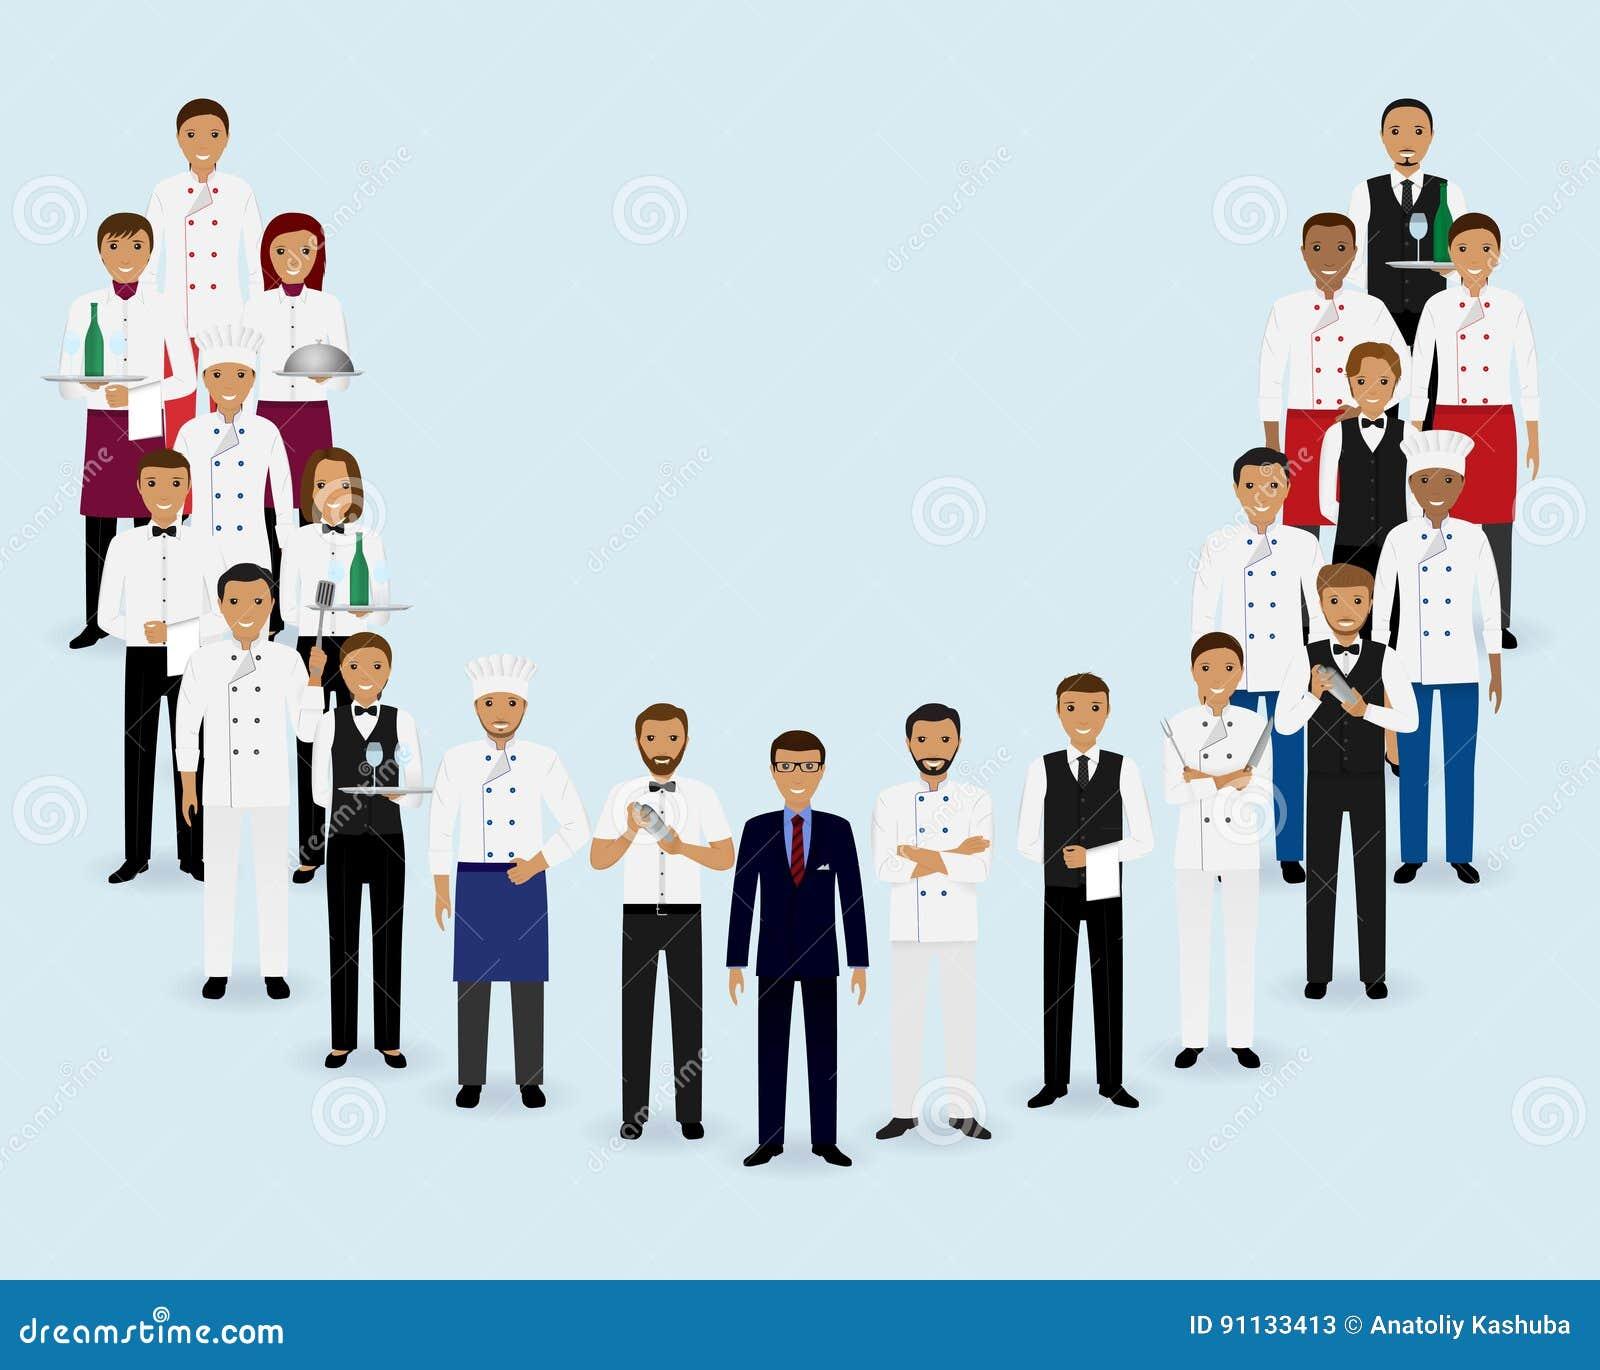 Restaurant Kitchen Manager Job Description: Restaurant Team. Group Of Manager Chef Waiters Bartenders Standing Together. Cartoon Vector